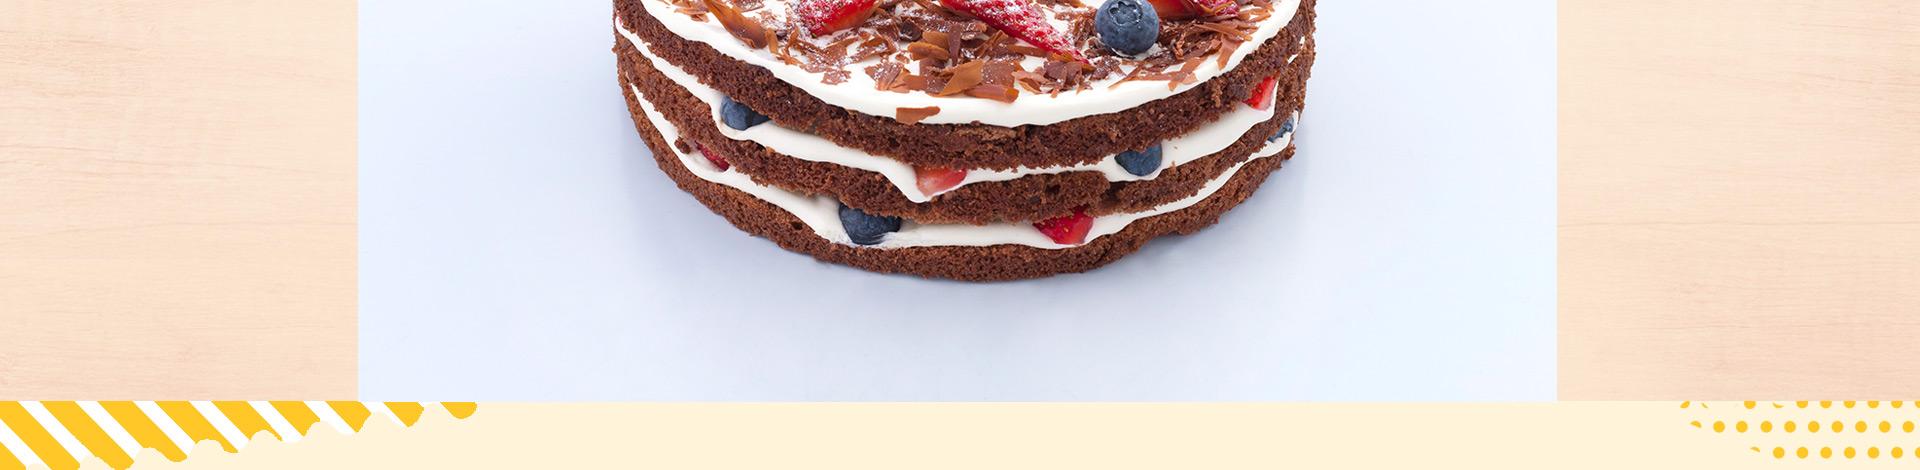 ebeecake小蜜蜂蛋糕 思念|缤纷乐园蛋糕